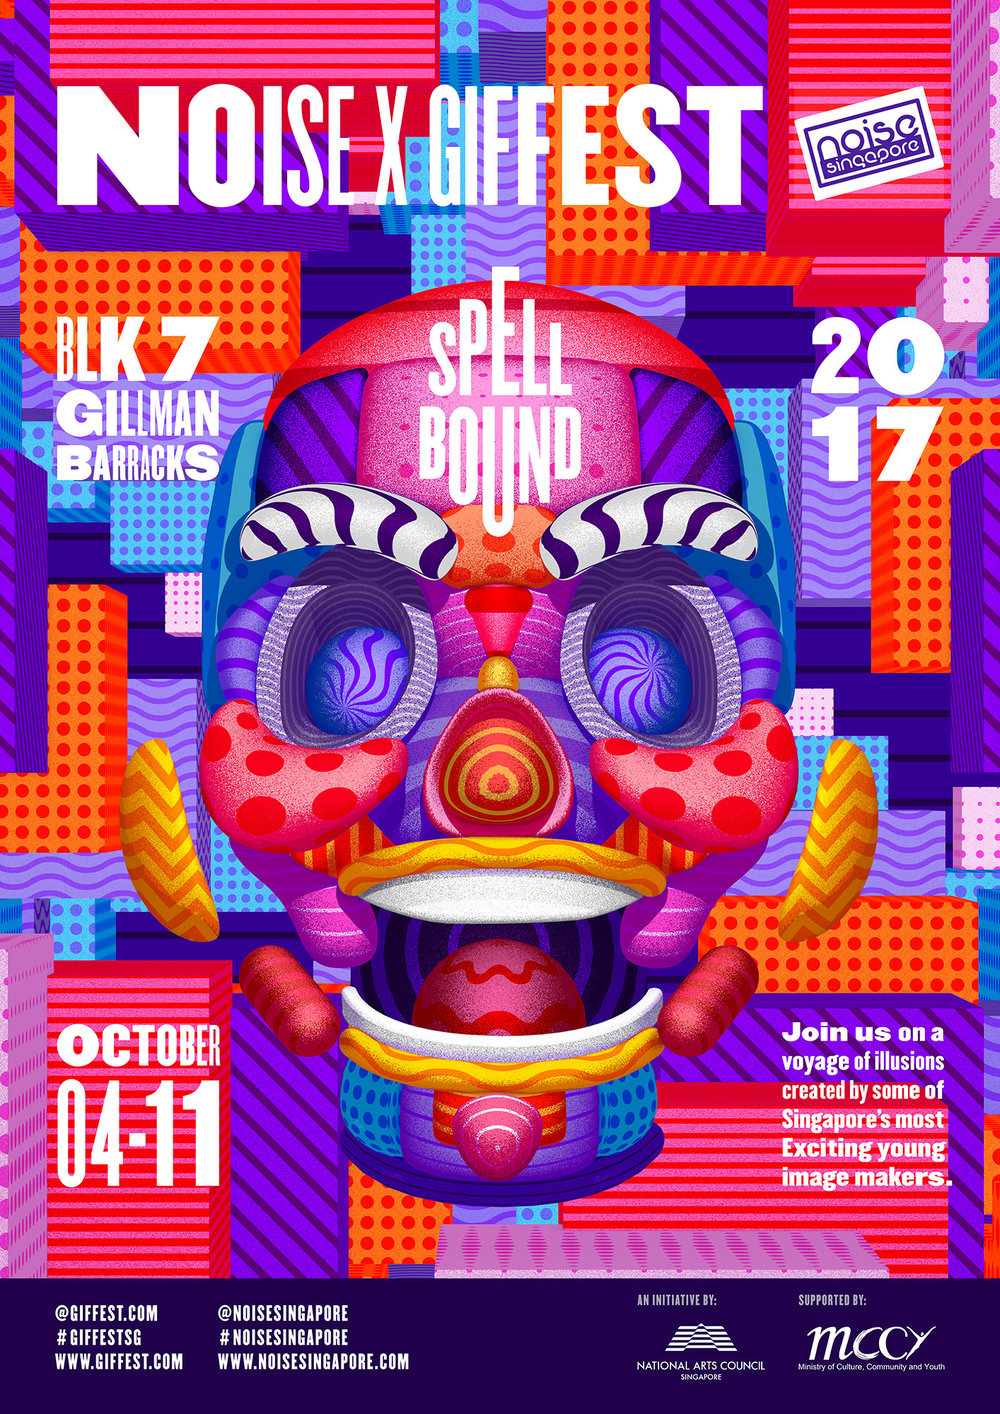 GIF Fest SG festival branding identity - Event poster for exhibition at Gillman Barracks, Singapore.